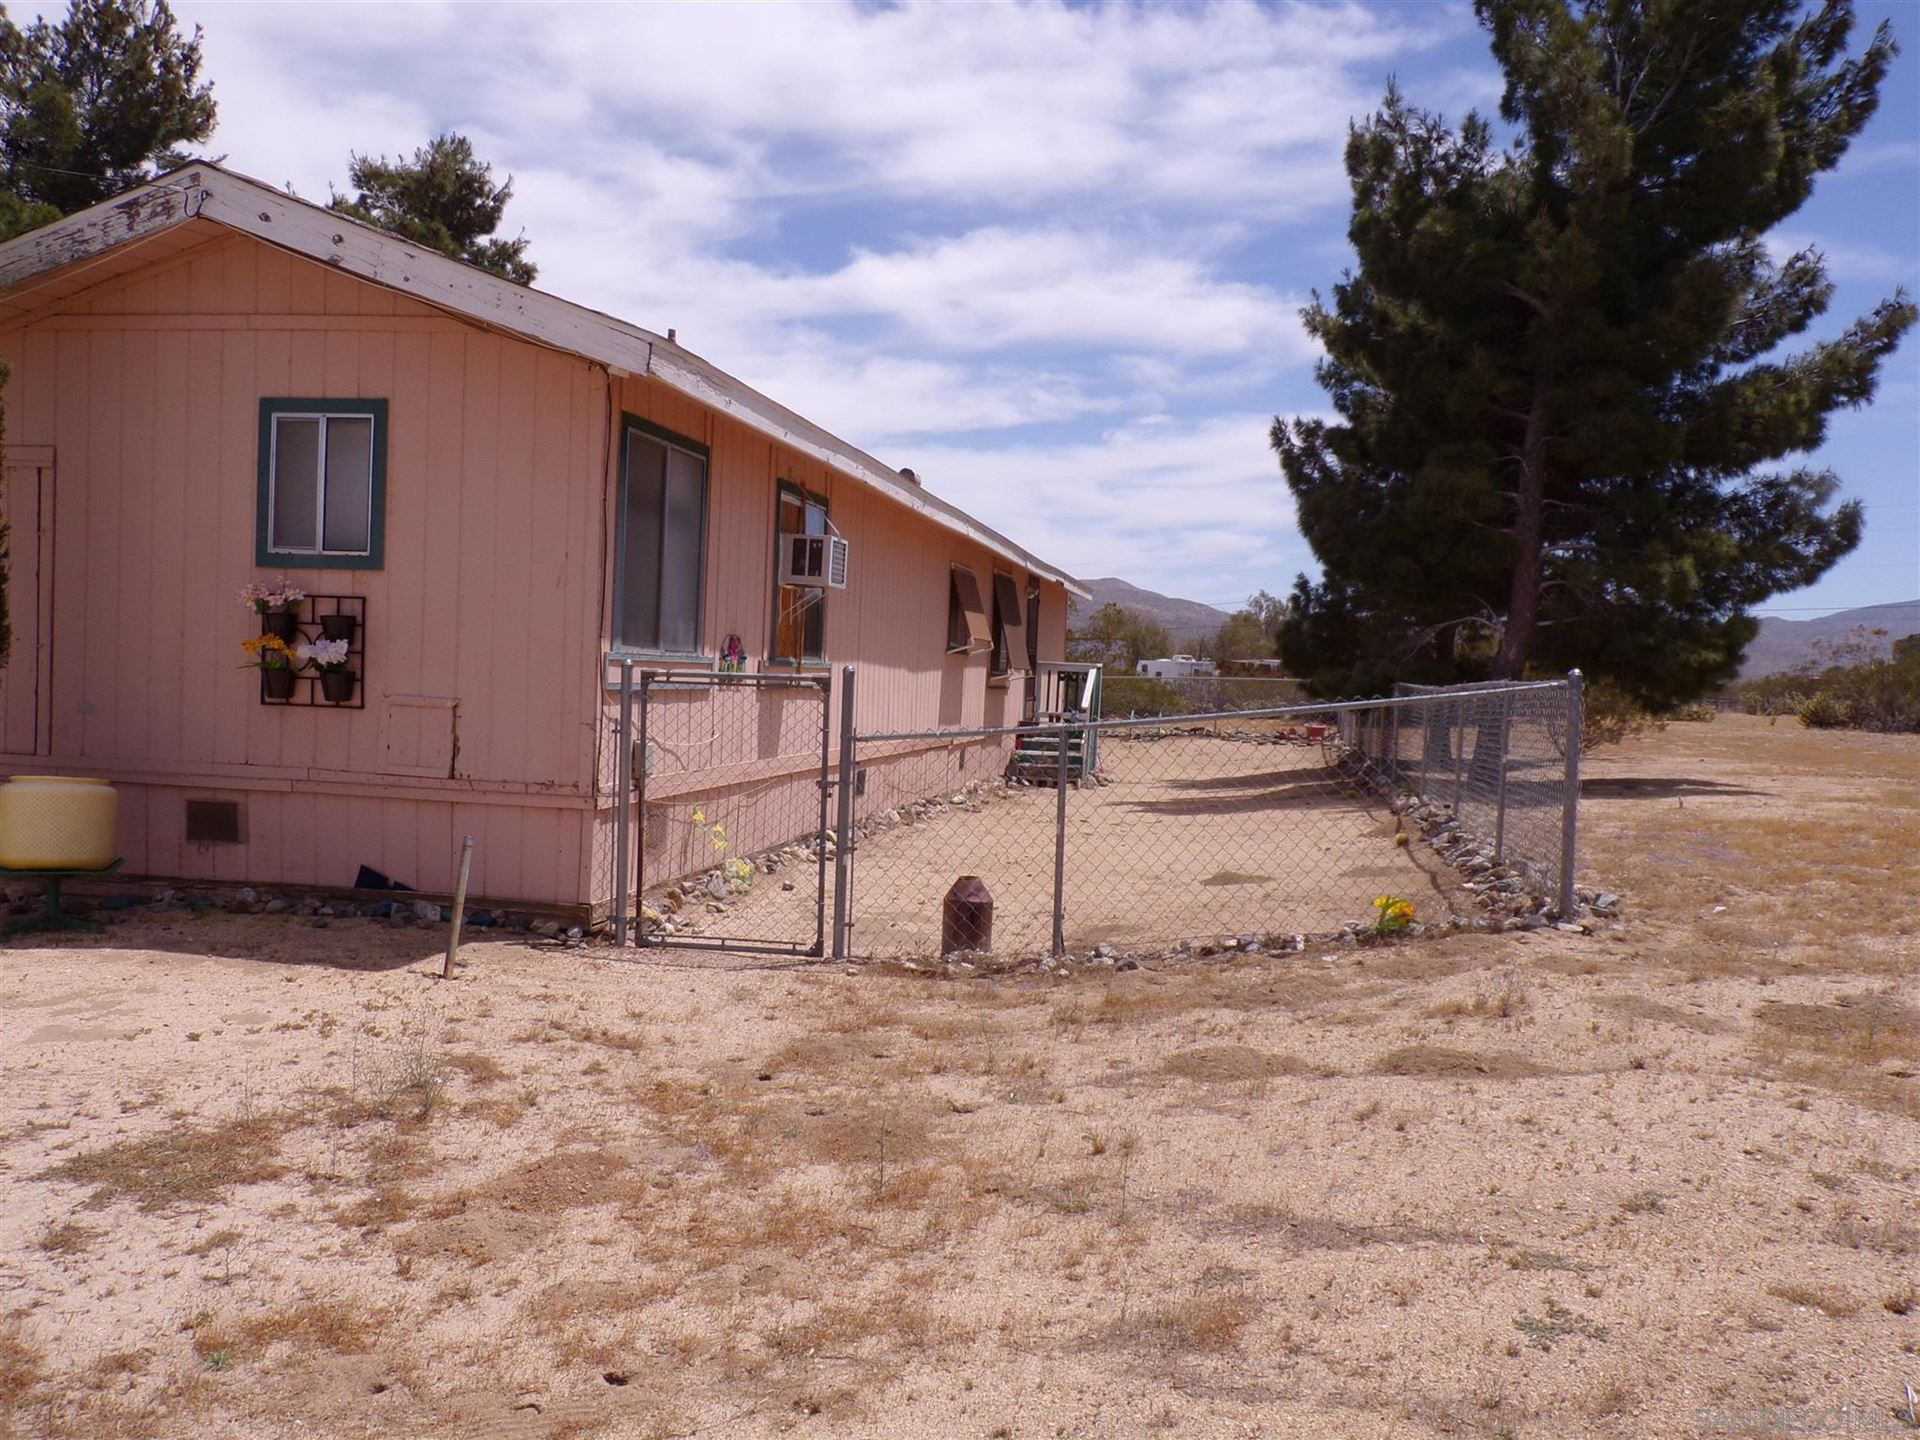 Photo of 7273 Hard Scramble Trail, Julian, CA 92036 (MLS # 210011991)